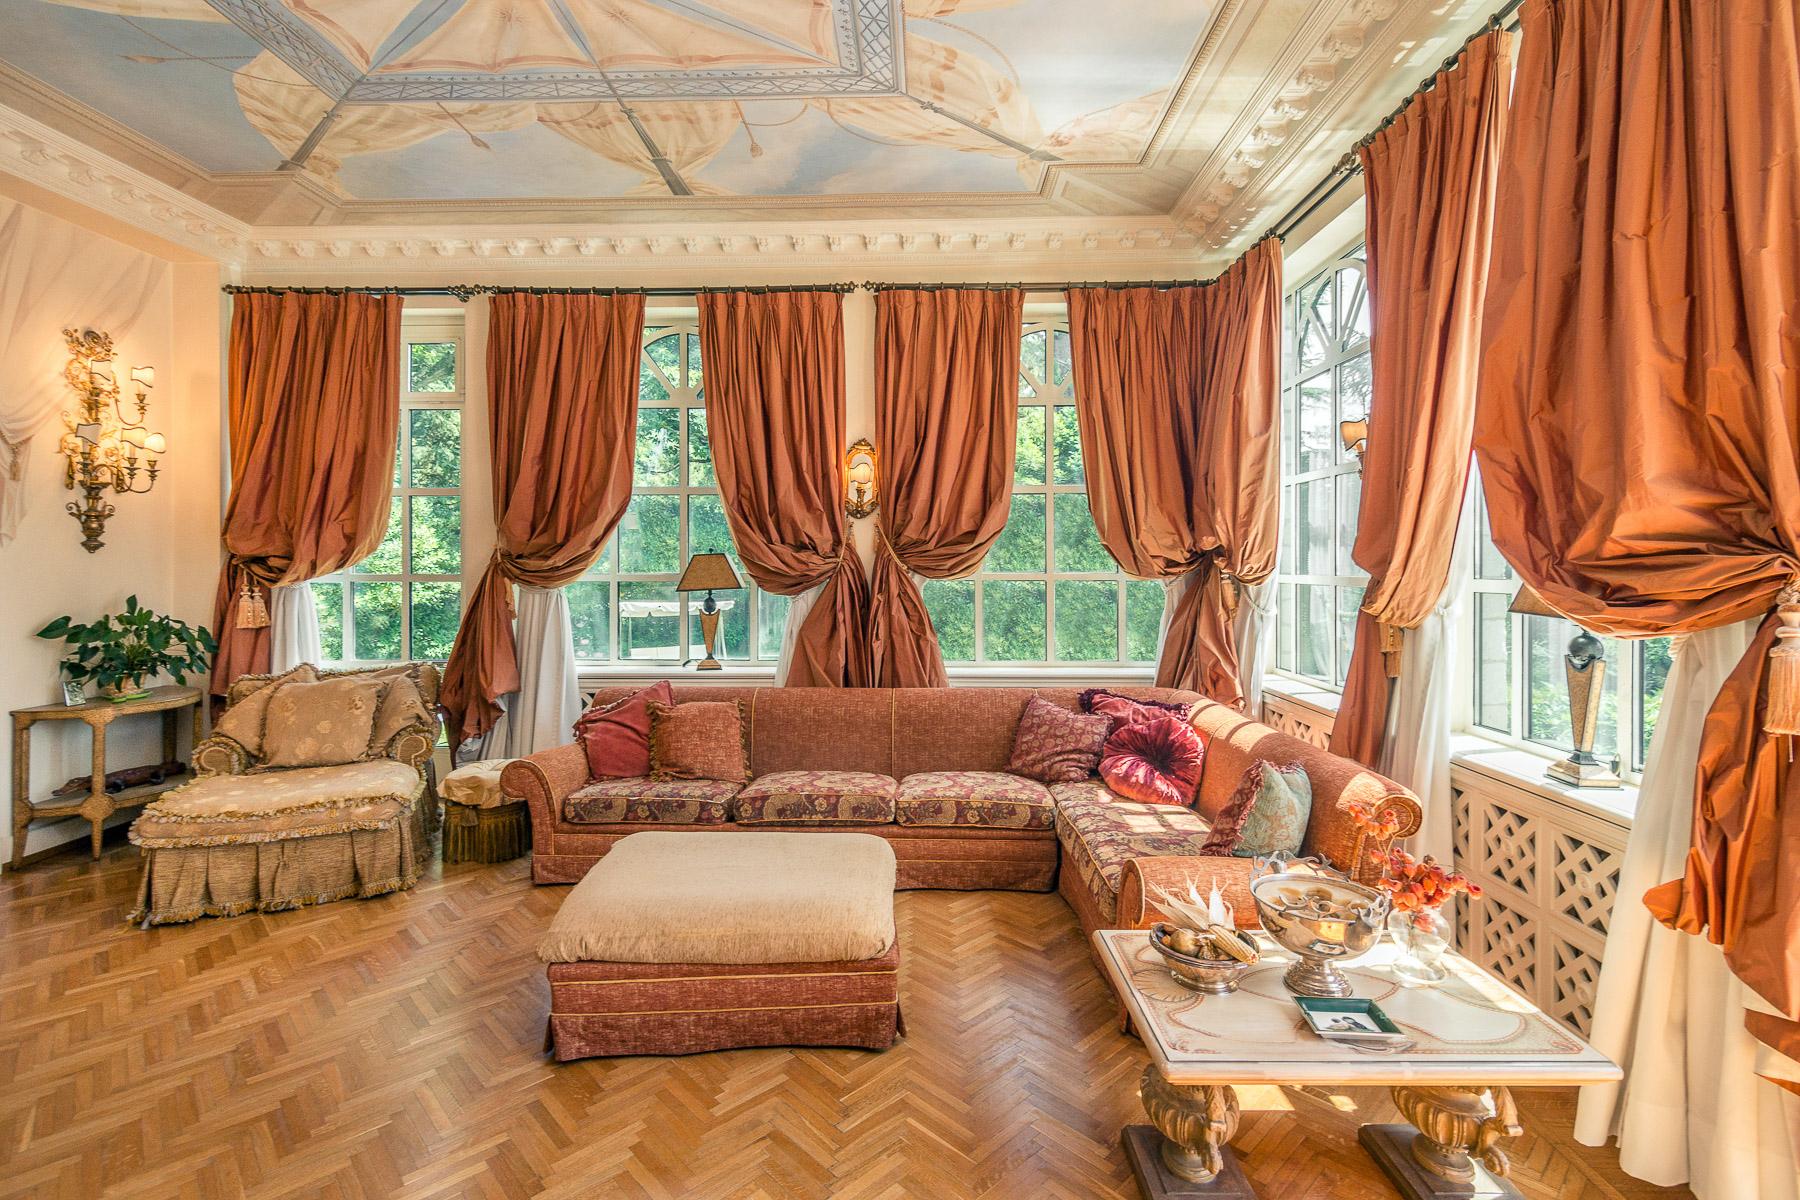 Villa in Vendita a Varese: 5 locali, 1150 mq - Foto 6